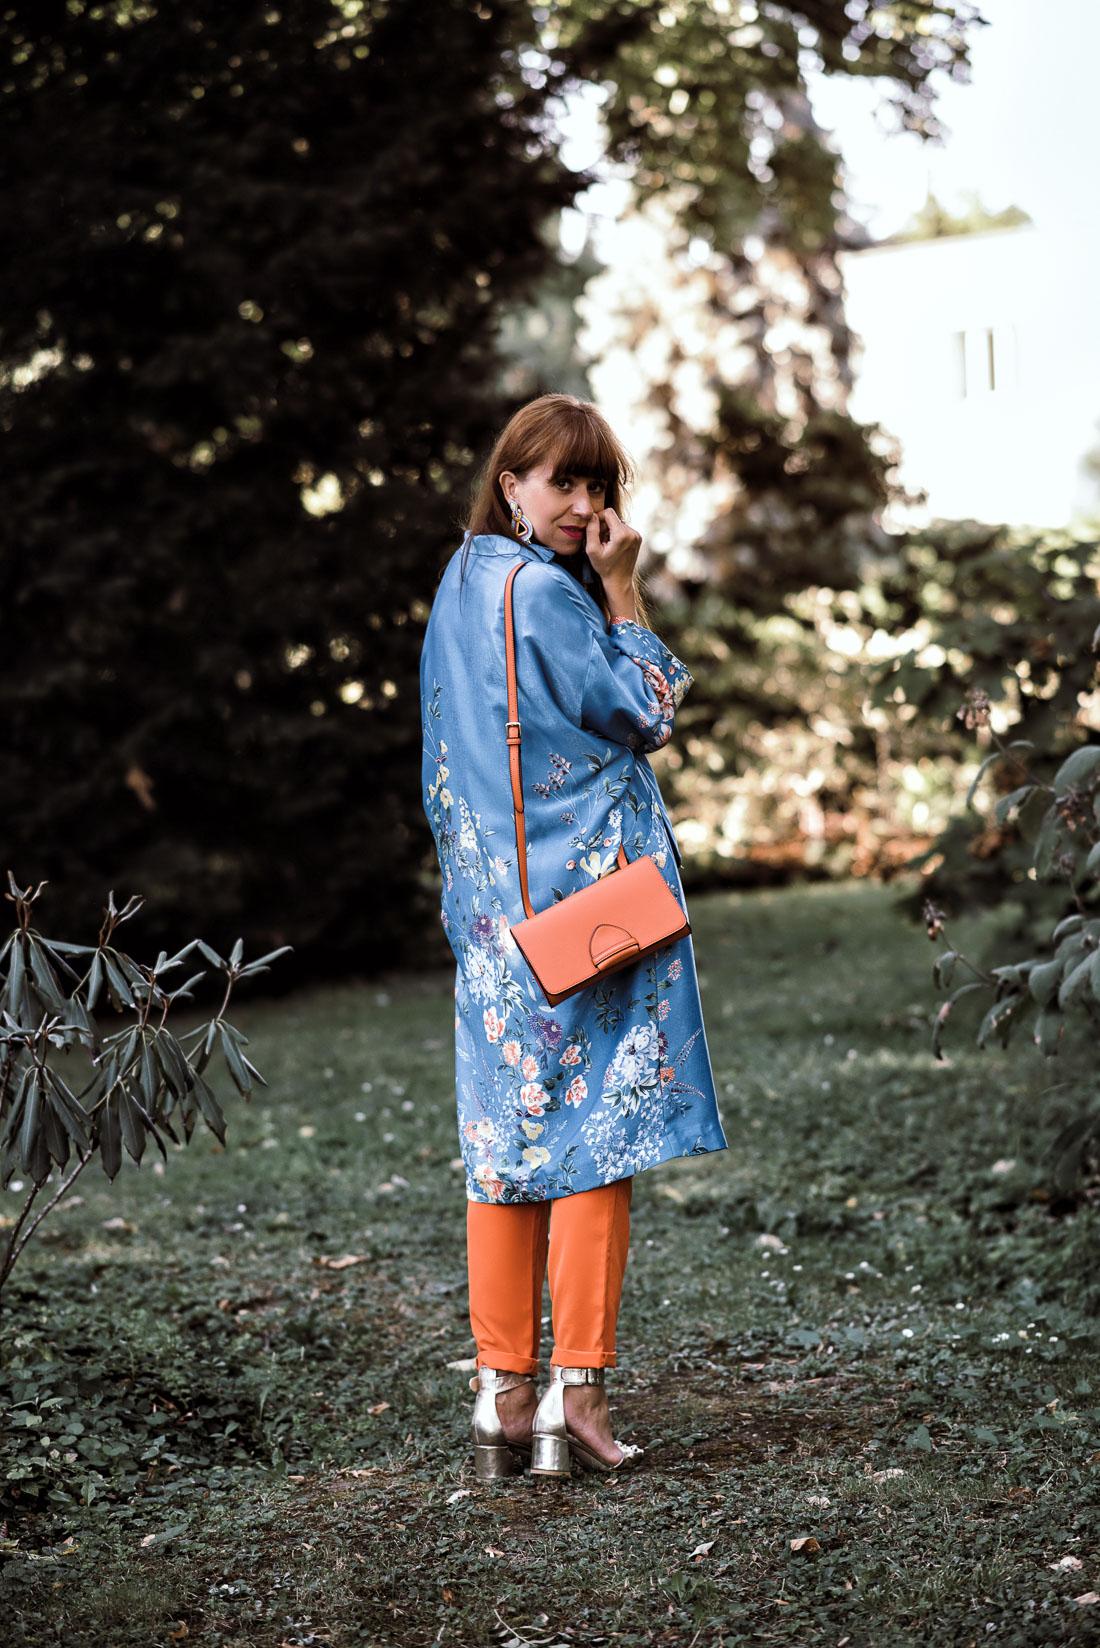 NOVÝ BYT, NOVÉ MOŽNOSTI_Katharine-fashion is beautiful_blog 12_Náušnice Bazu_Kvetinové kimono ZARA_Katarína Jakubčová_fashion blogerka